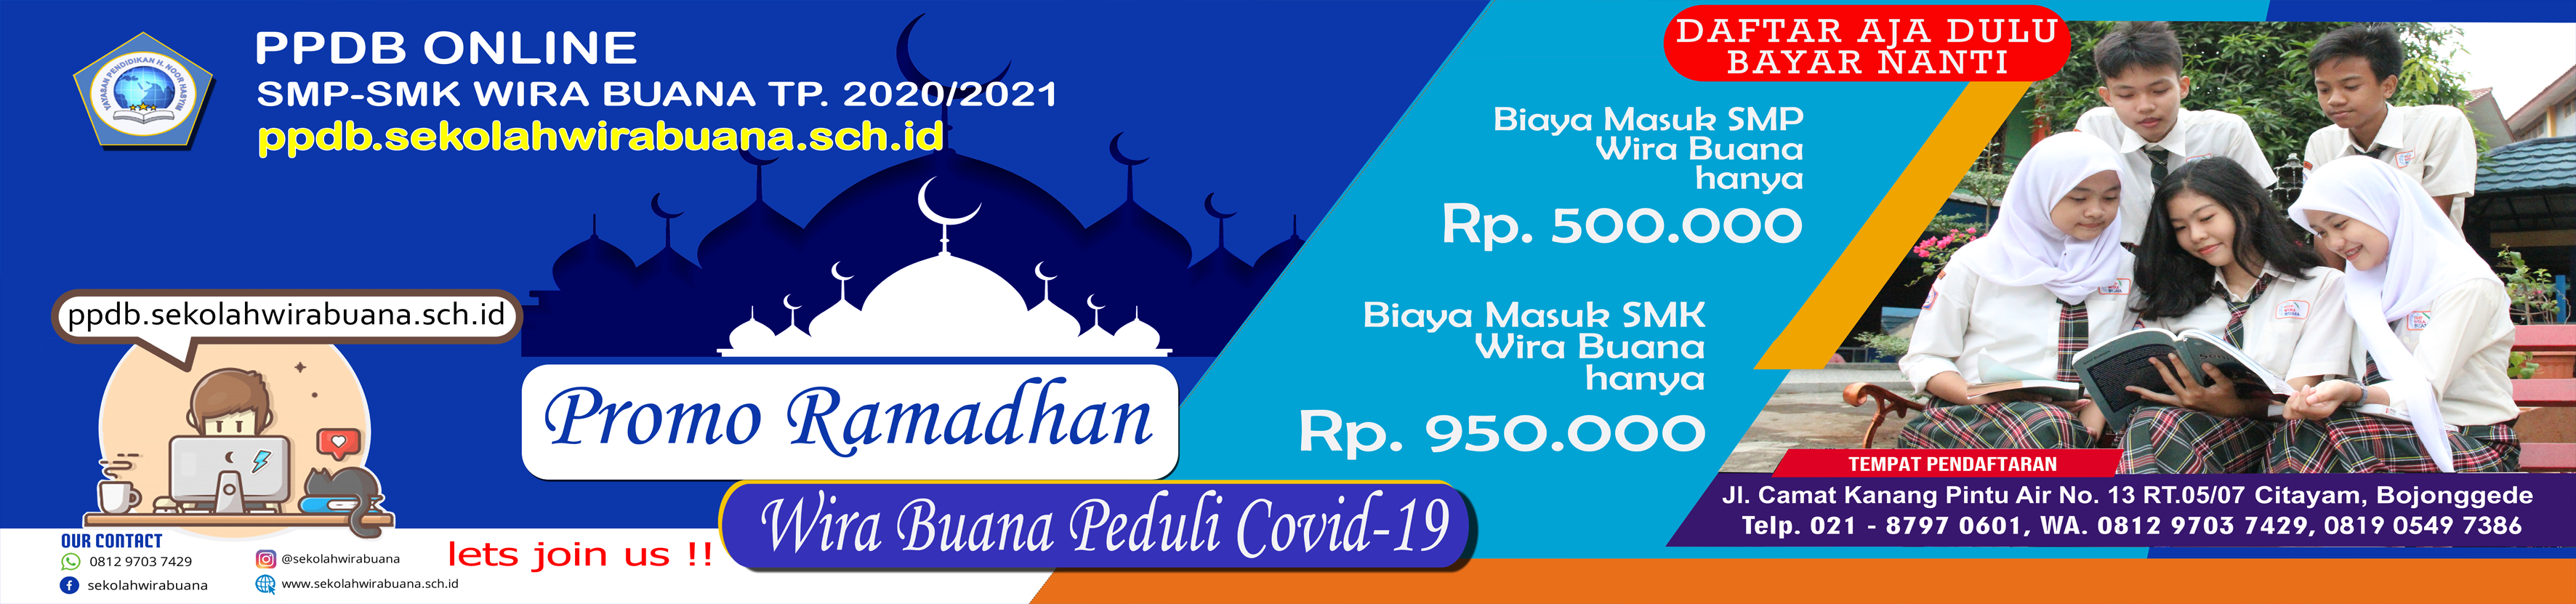 Promo Ramdhan